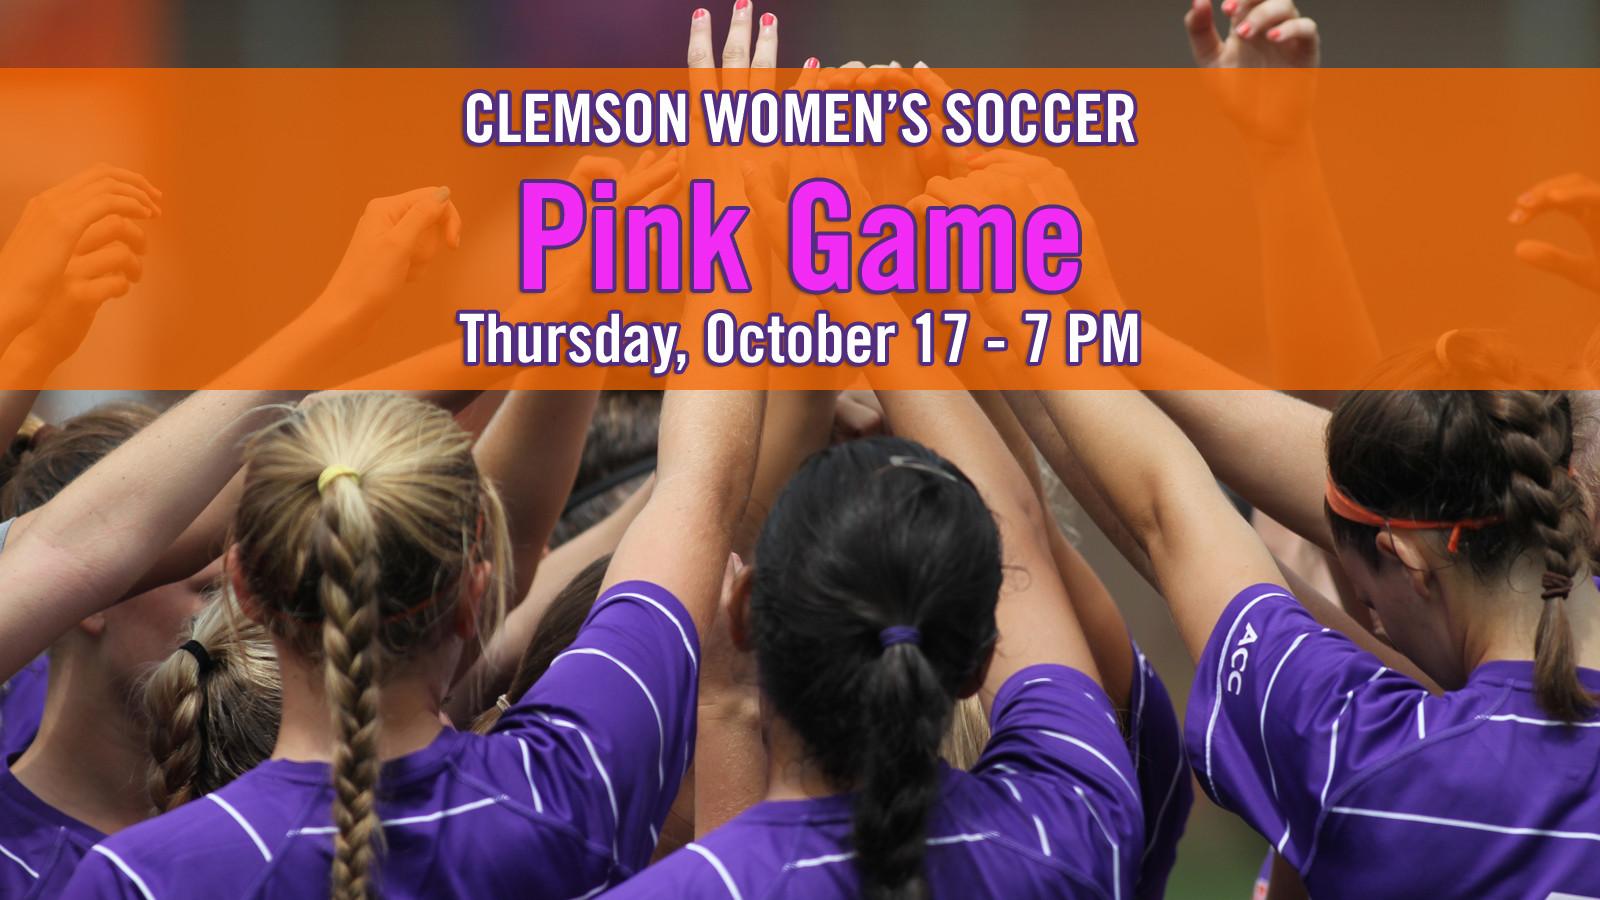 Clemson Women's Soccer Team to Host Pink Game October 17